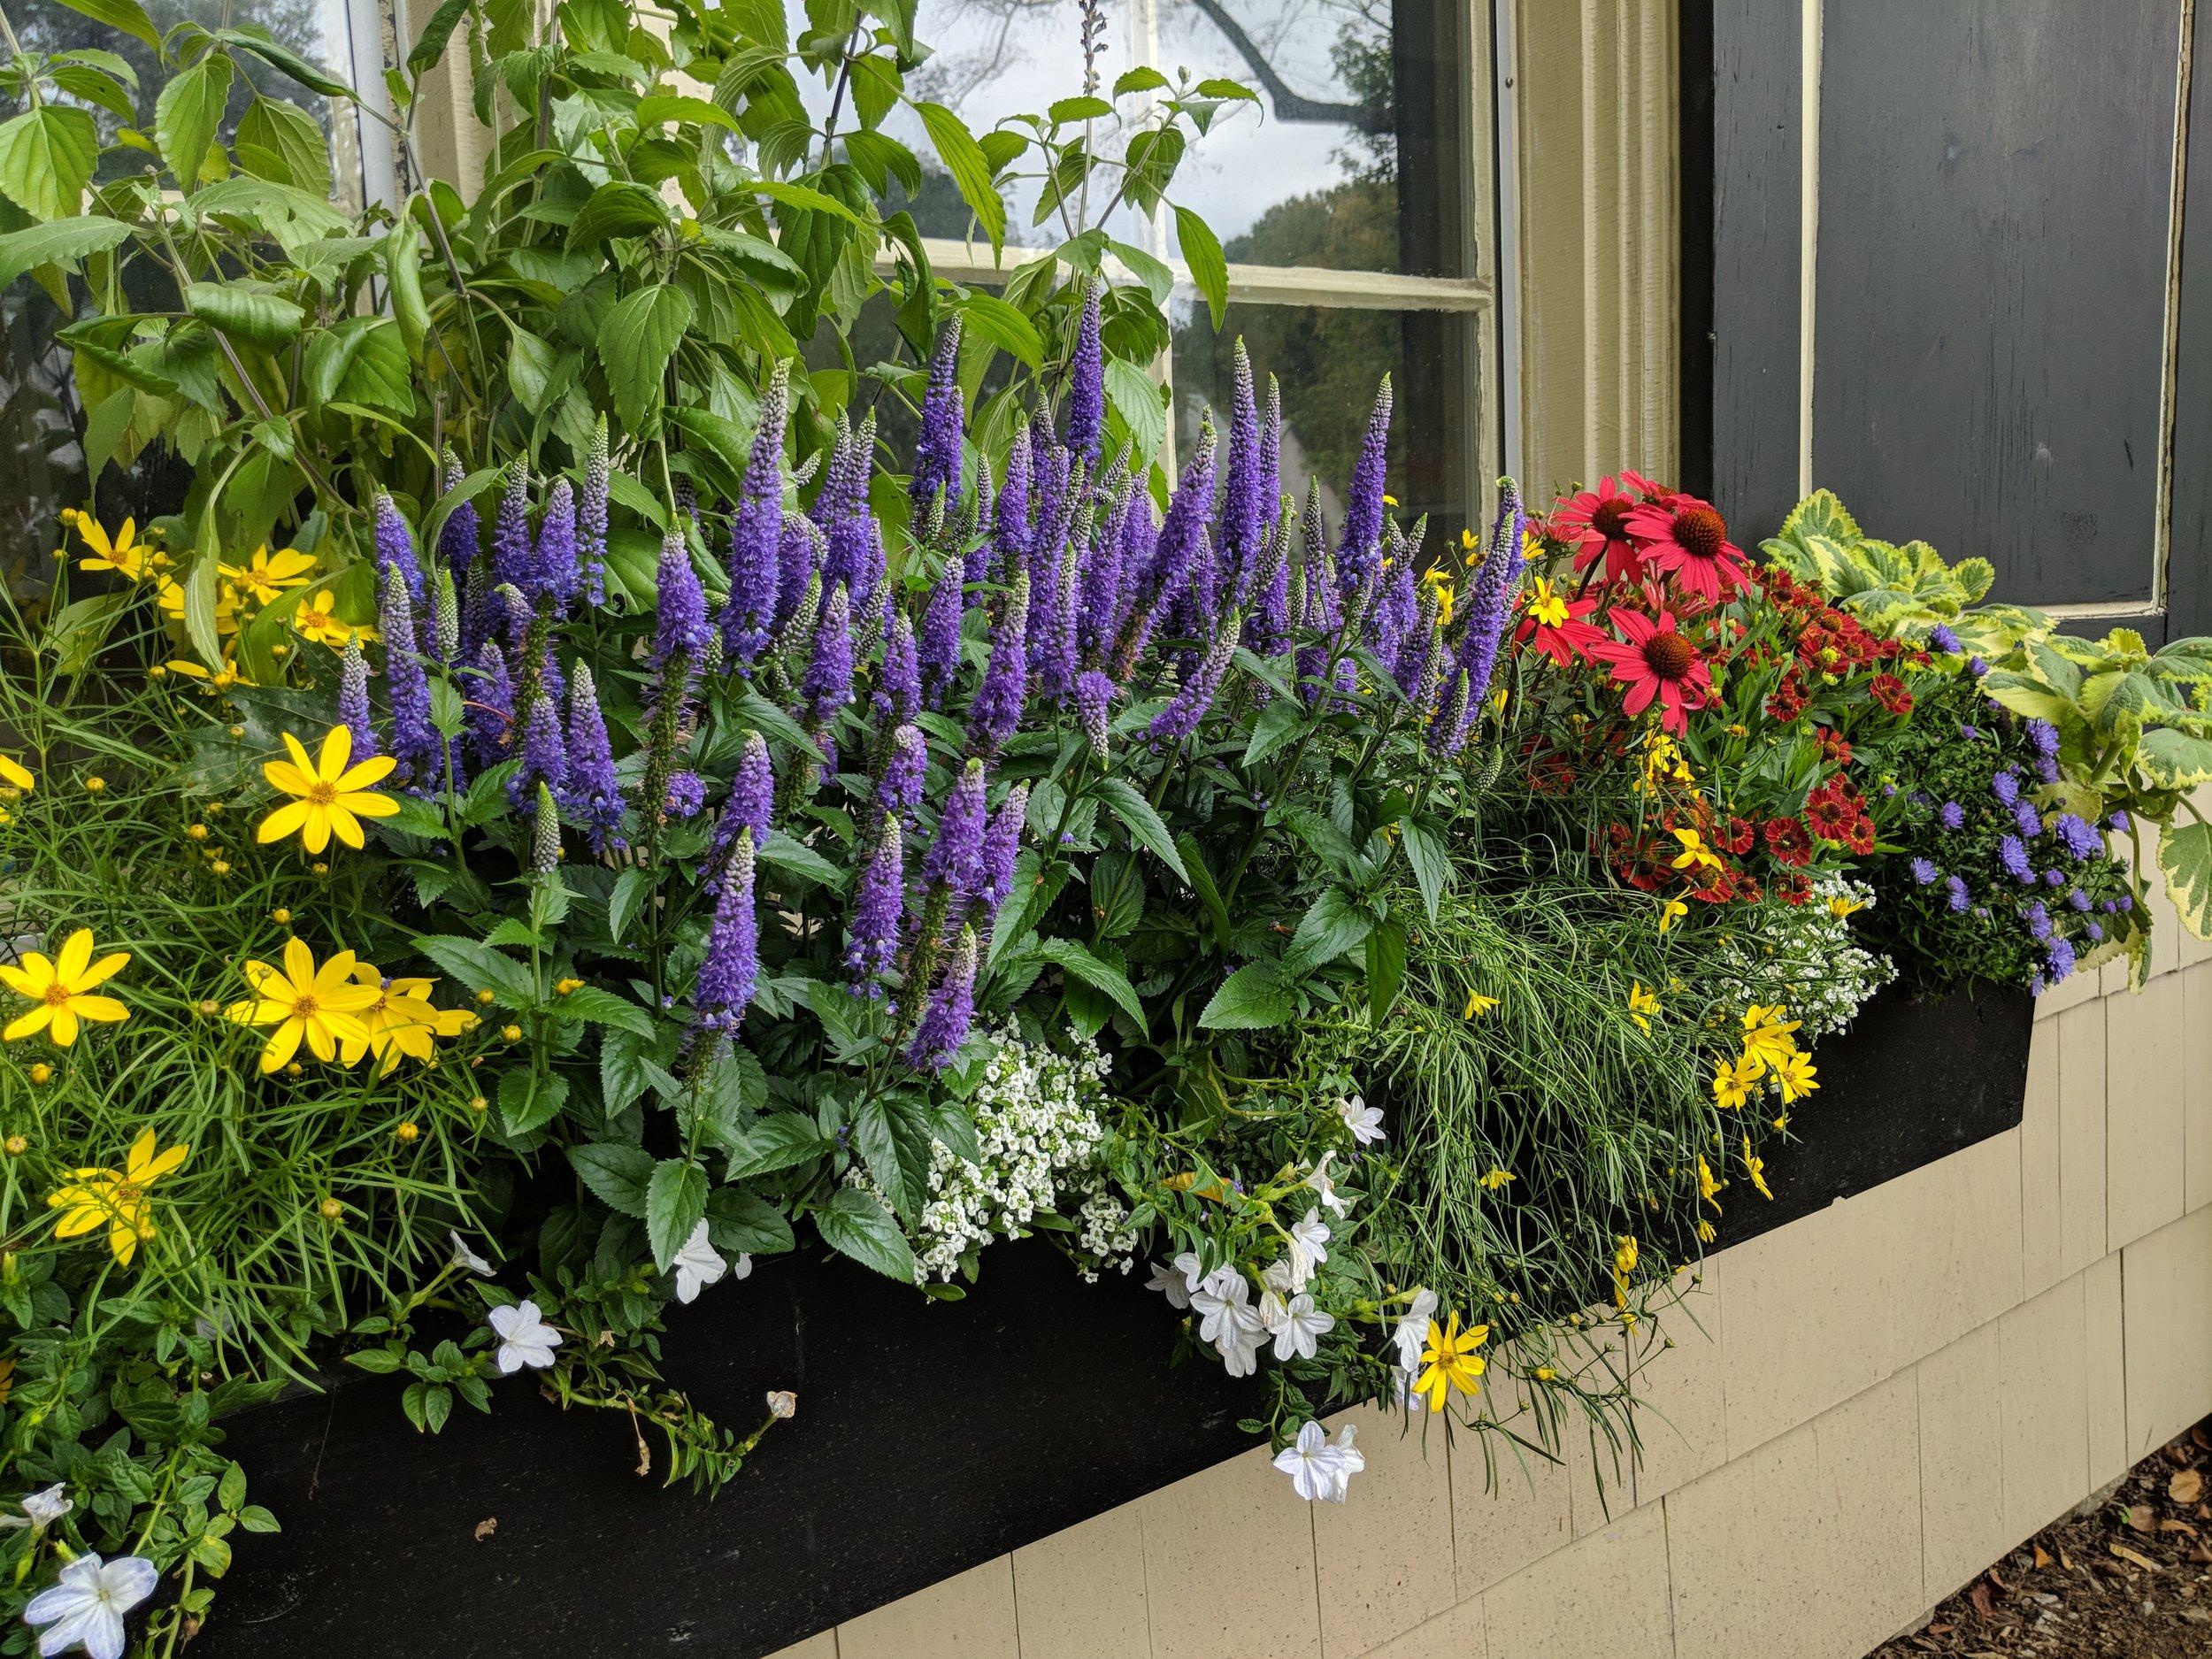 Summer window box in full bloom